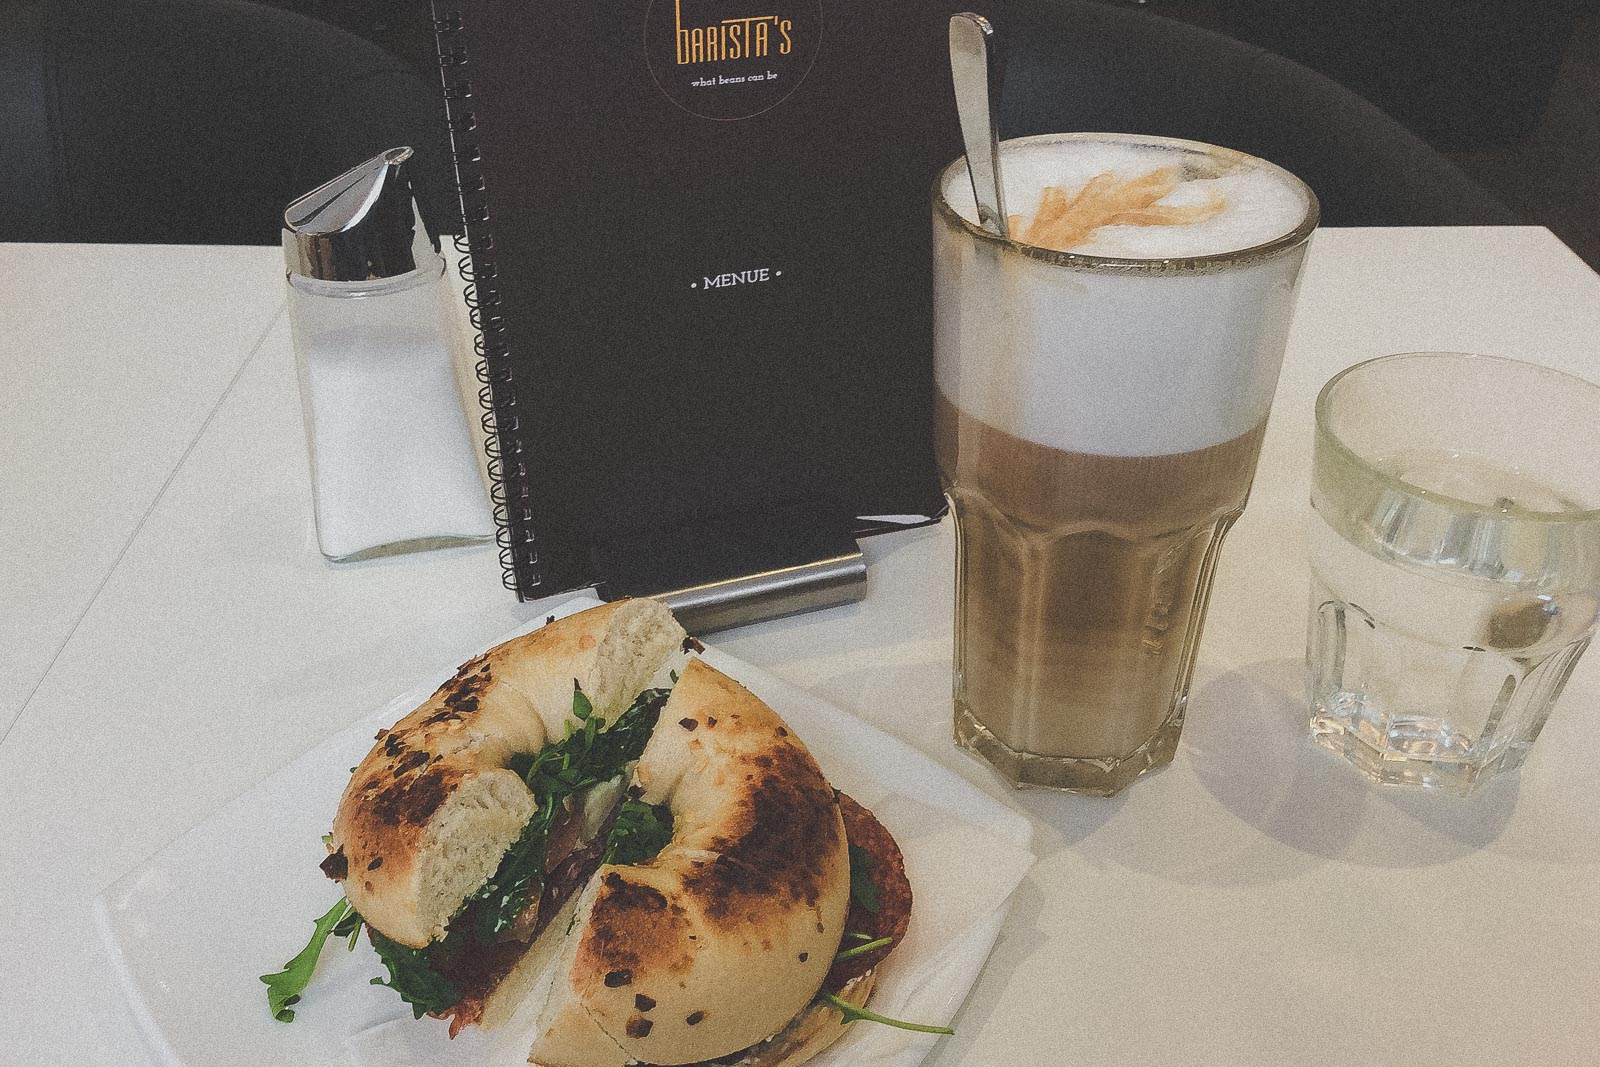 Barista's, Kaffee trinken in Graz - Das sind die besten Cafés & Coffee Shops // Cafés in Graz, Kaffee trinken, Graz Blog, www.miss-classy.com #cafe #kaffee #graz